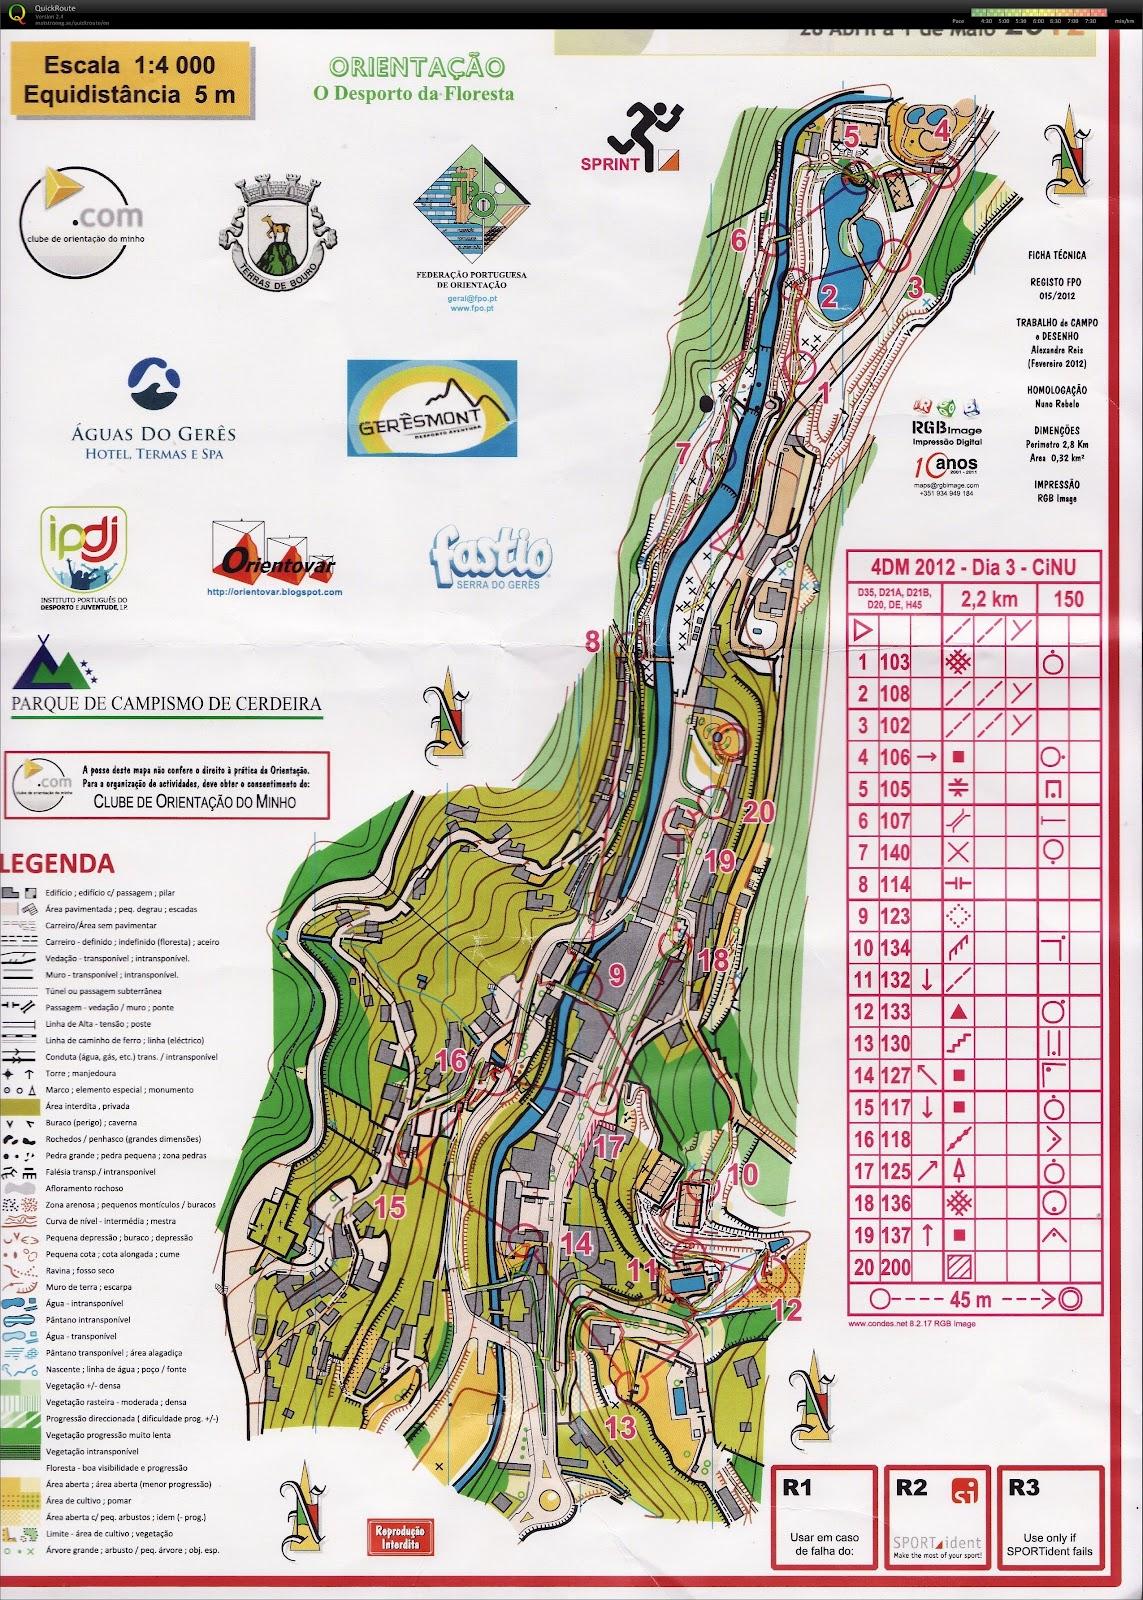 mapa turistico do geres Mariana Moreira: May 2012 mapa turistico do geres